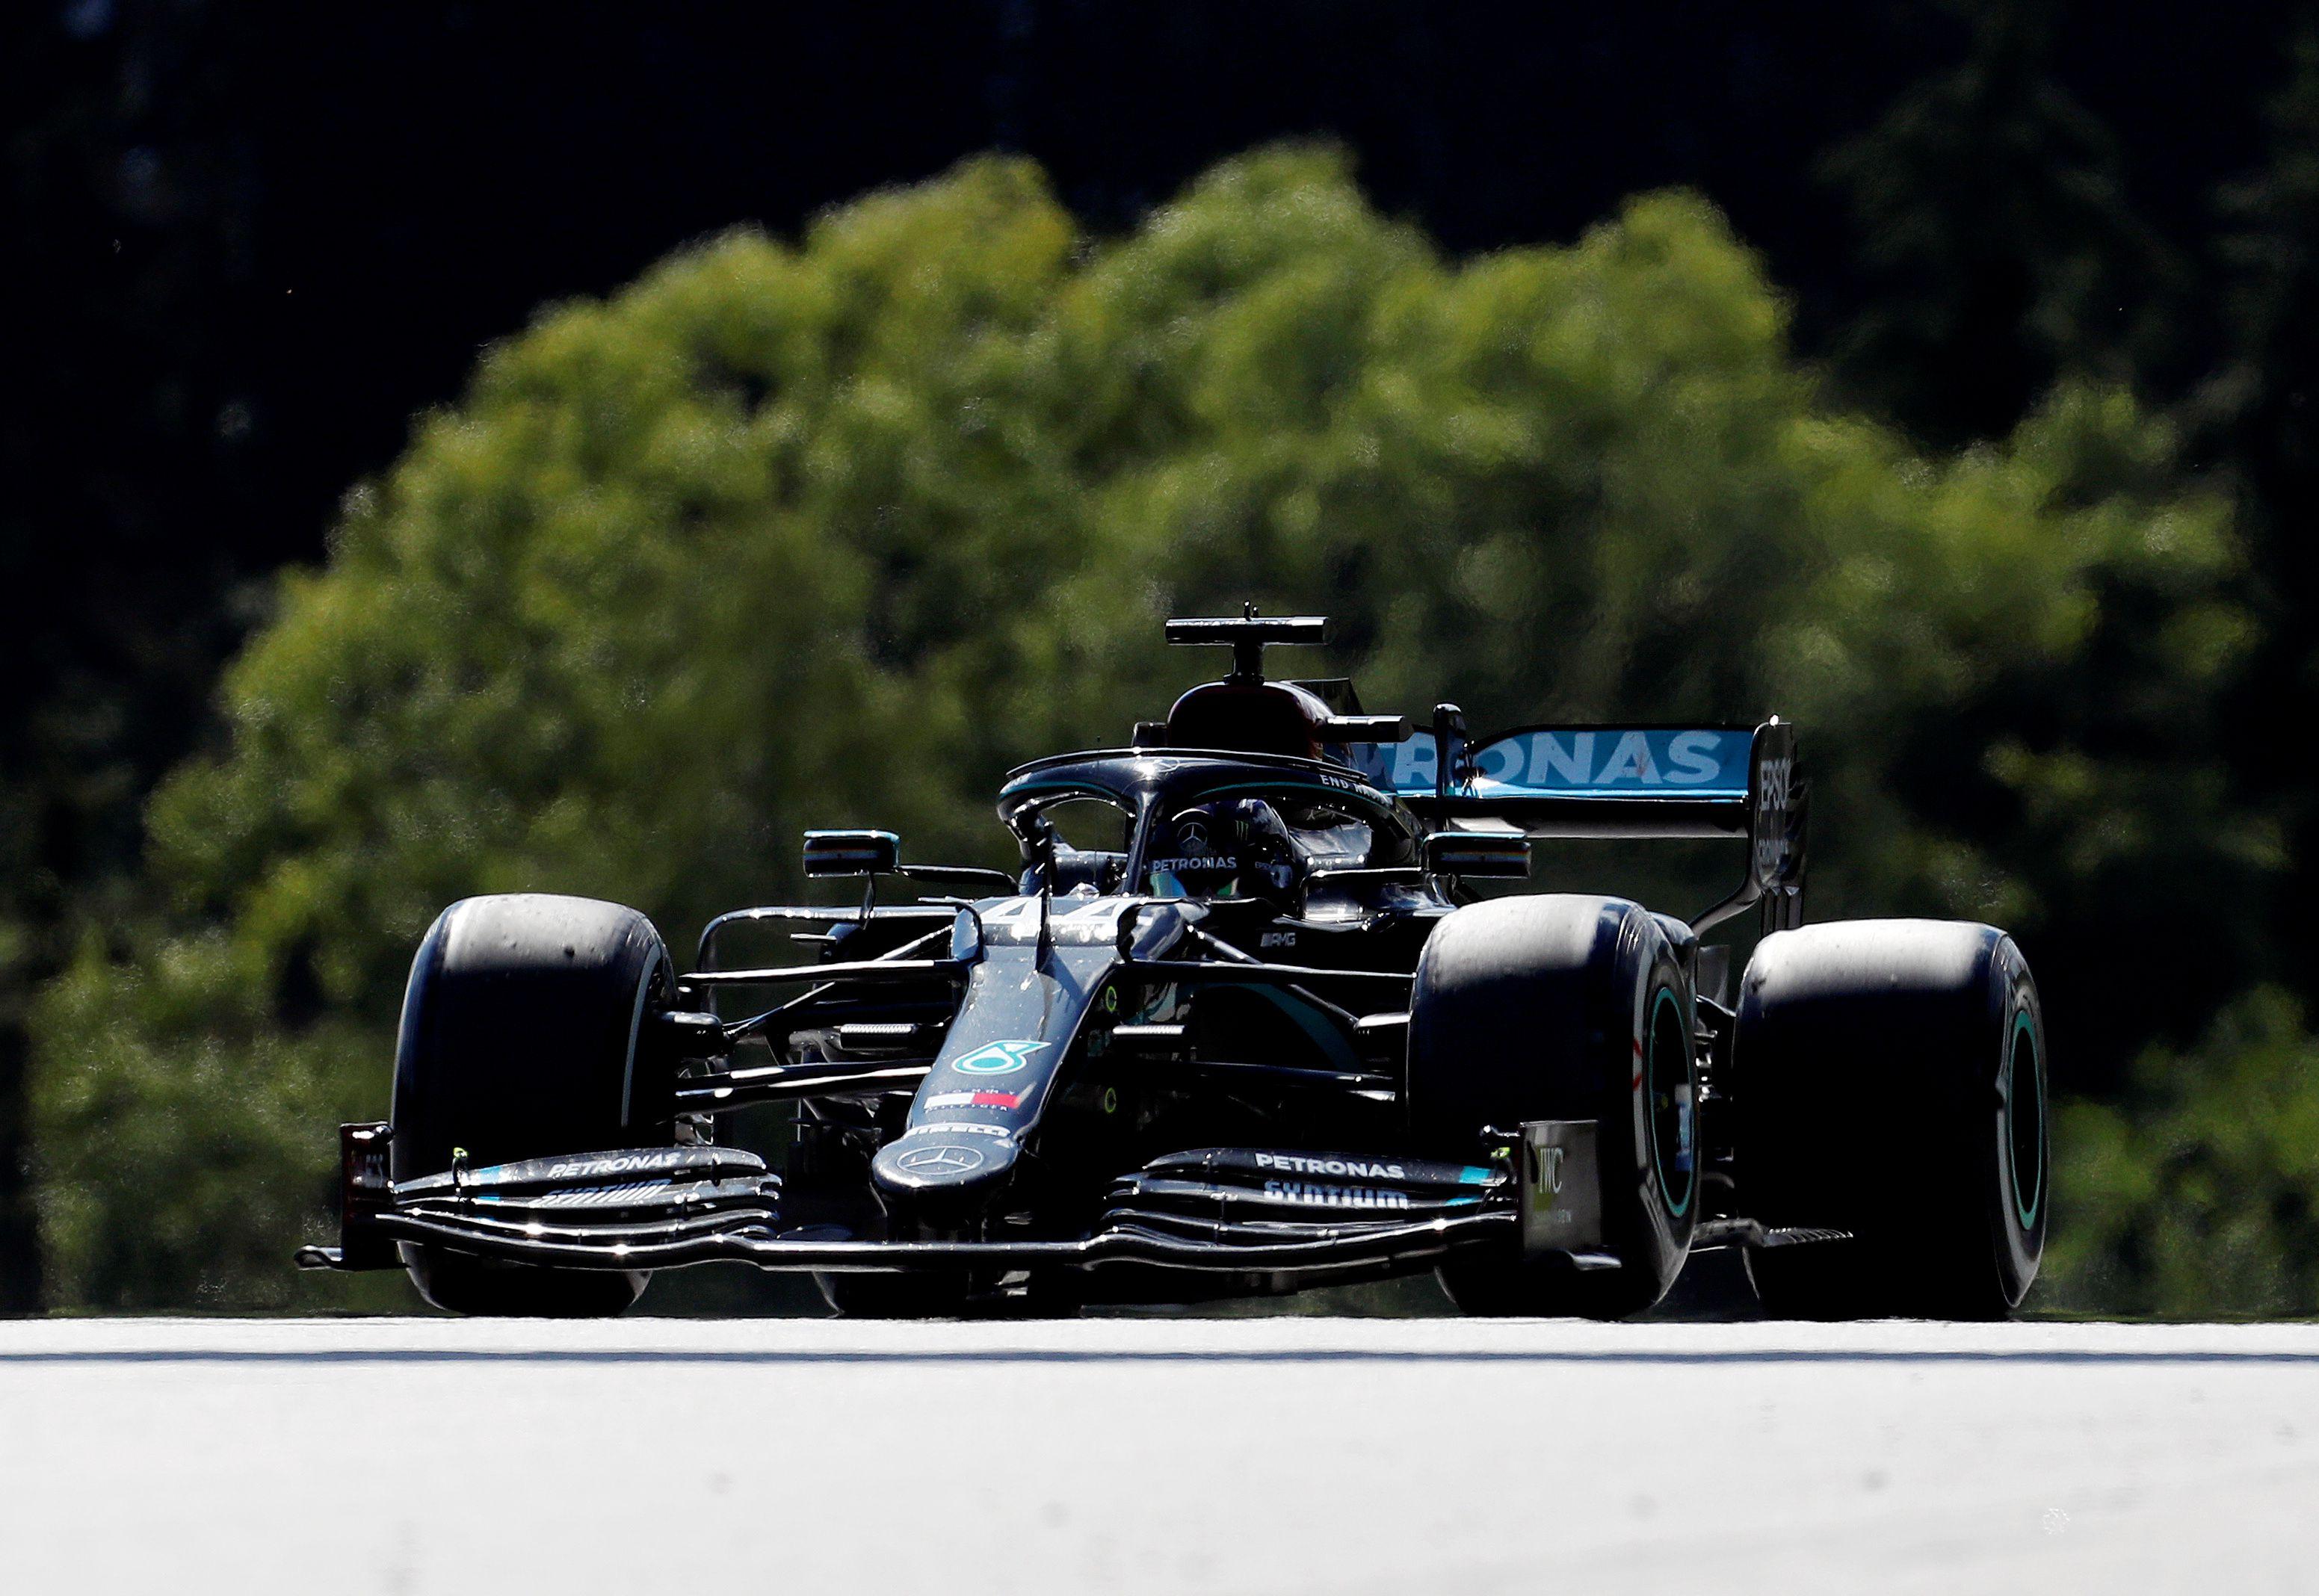 Hamilton terminó cuarto en Austra (Darko Bandic/Pool via REUTERS)